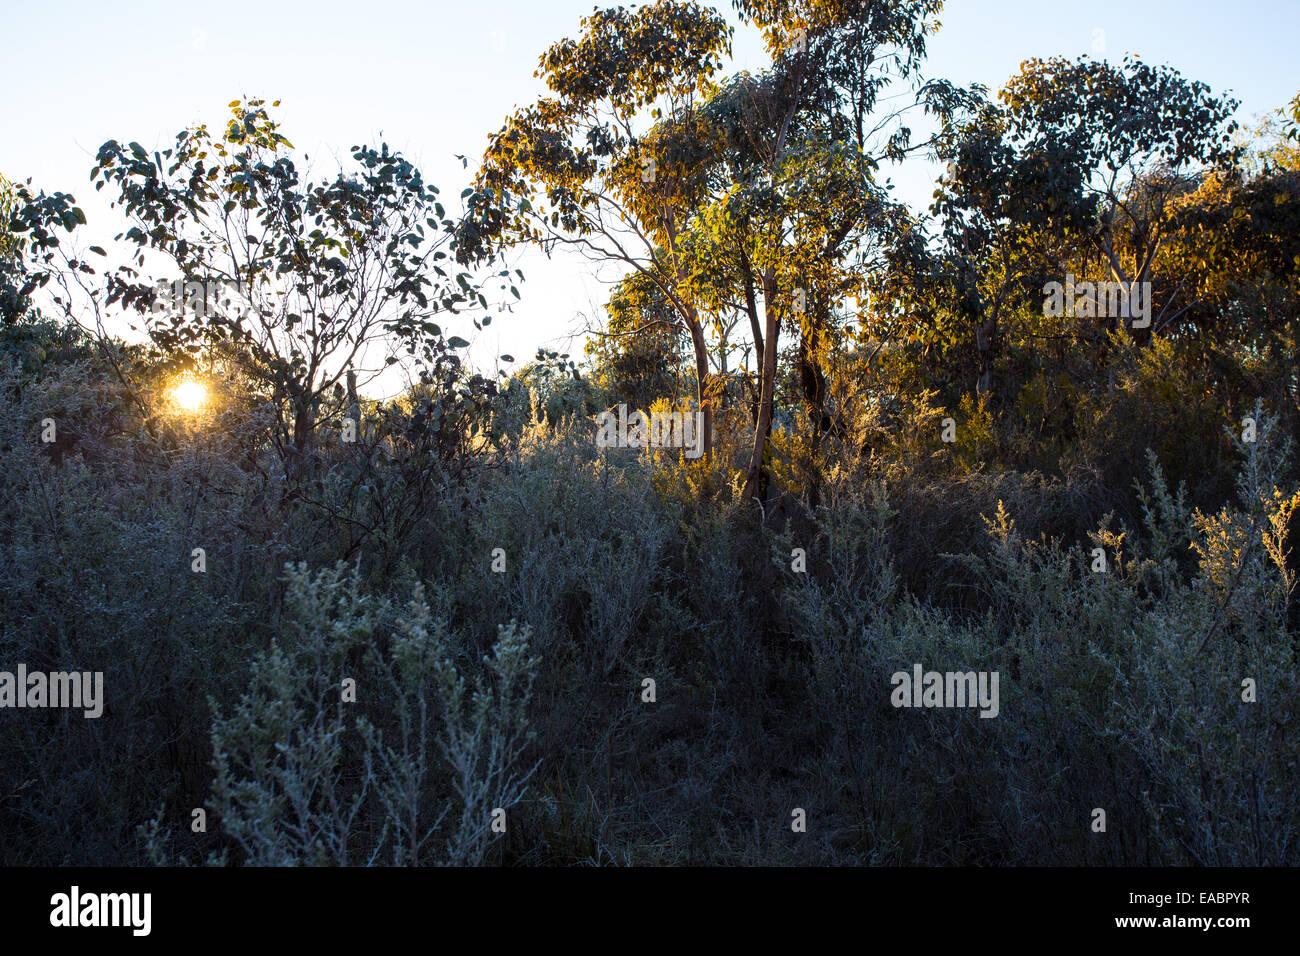 Bushland in Kings Plains National Park, NSW, Australia - Stock Image